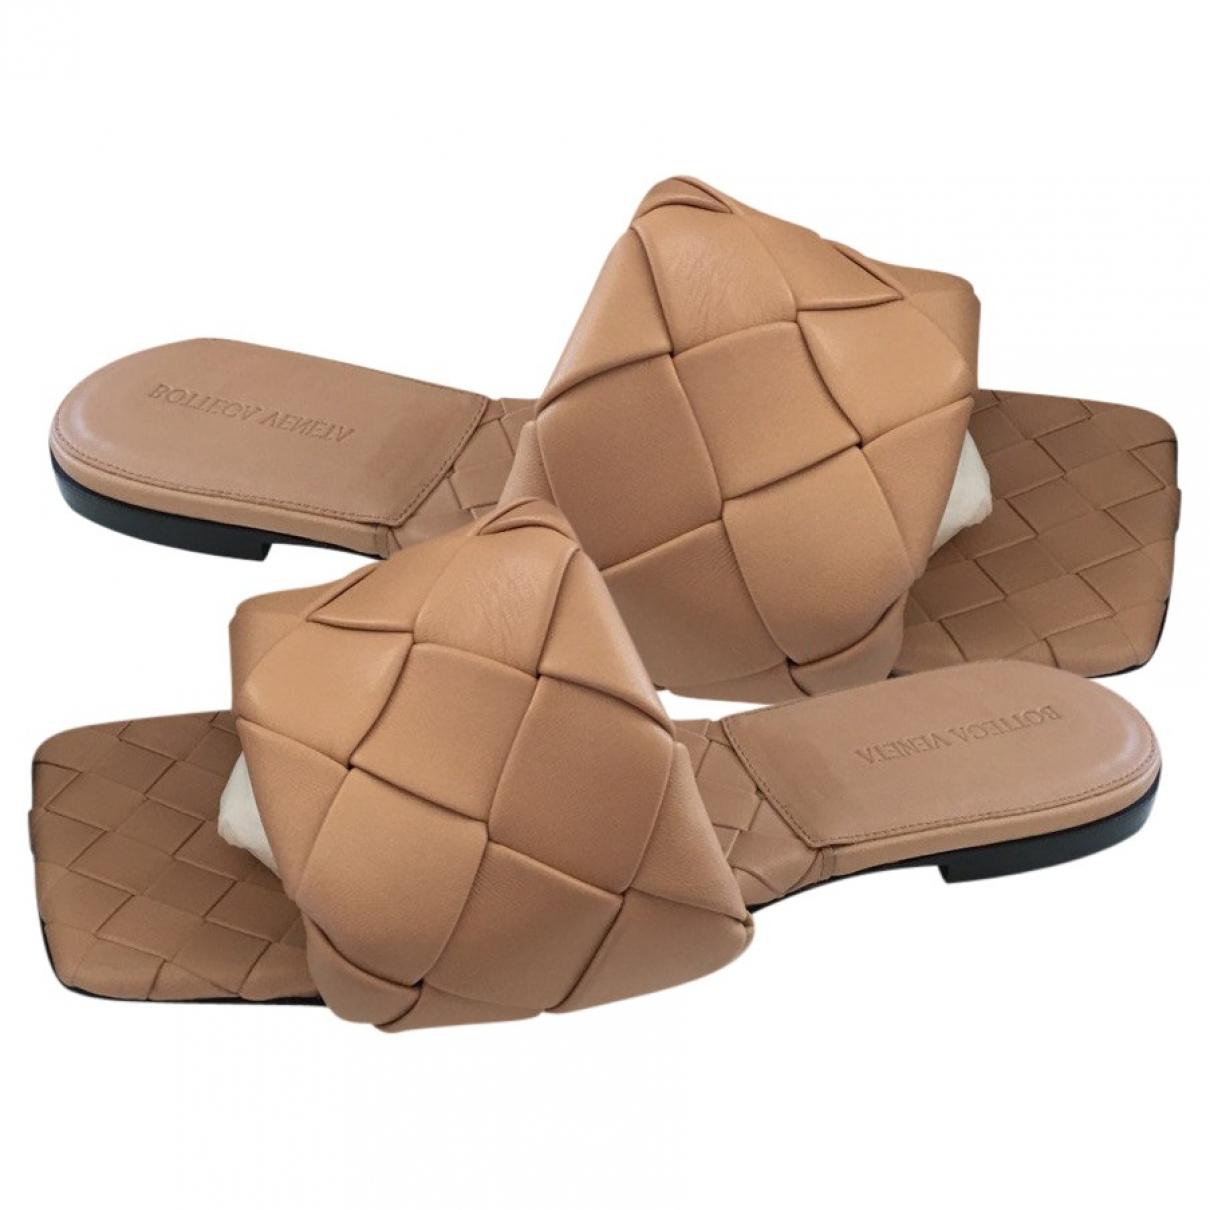 Bottega Veneta - Sandales BV Lido pour femme en cuir - camel